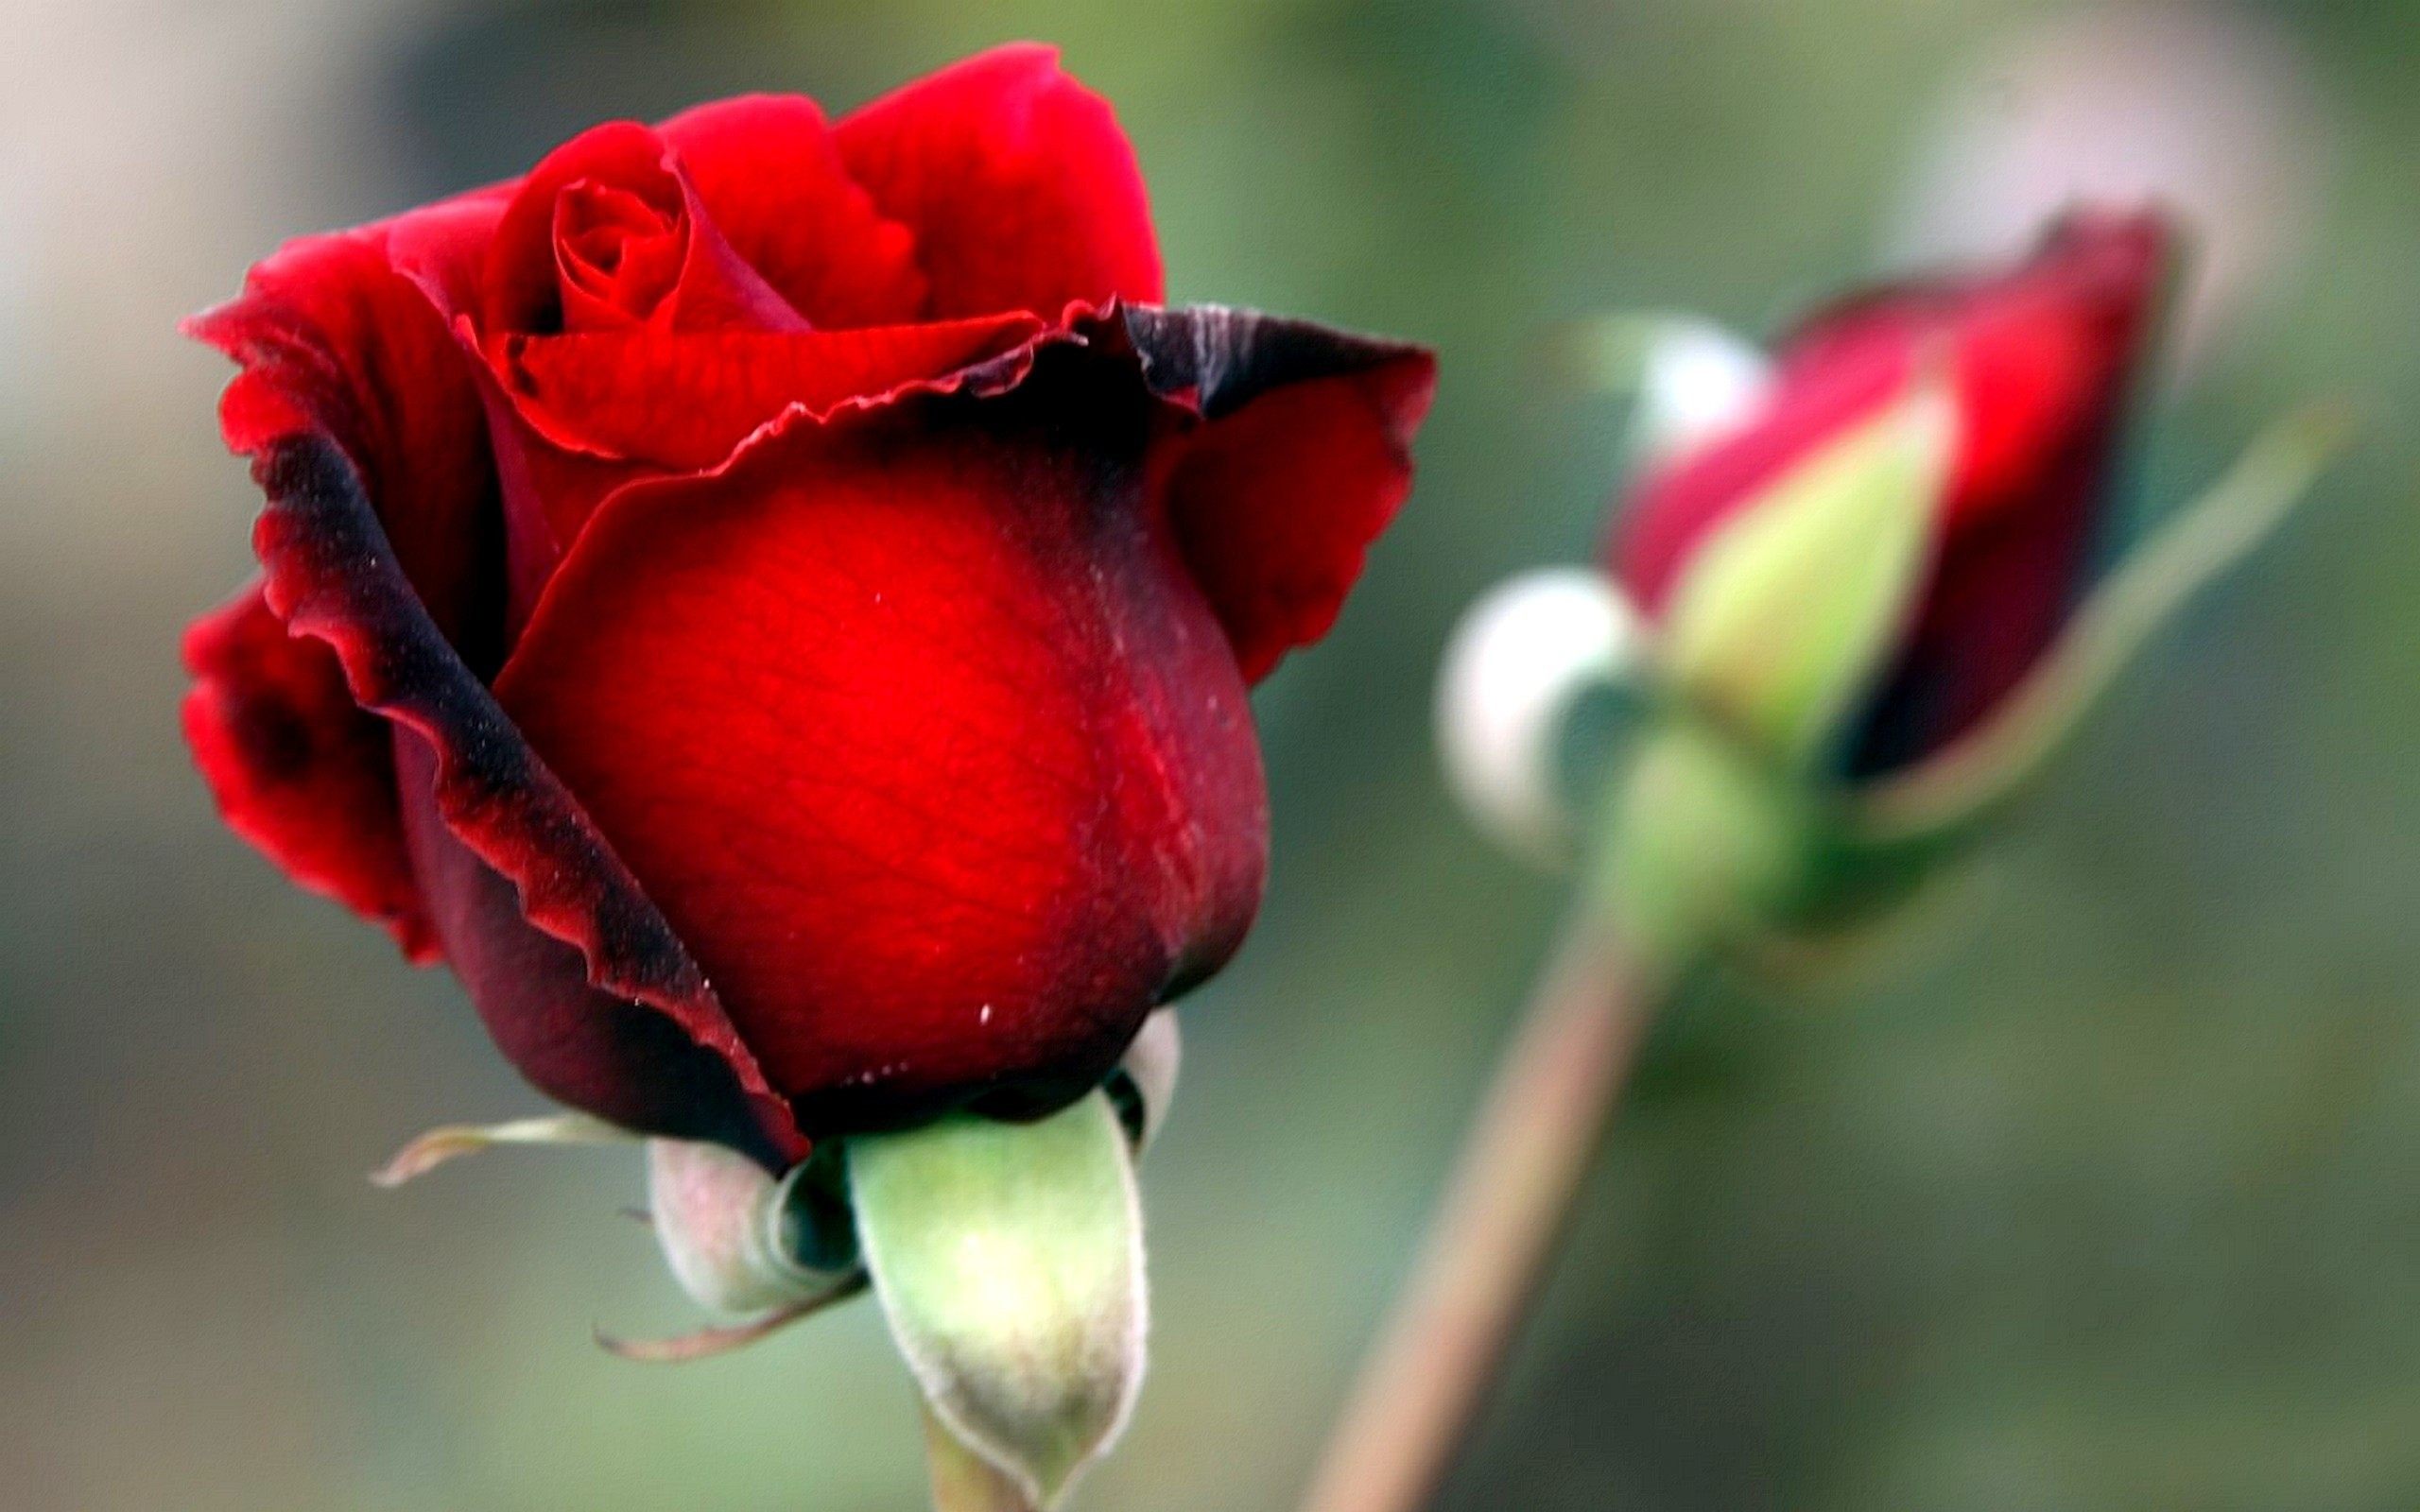 Res: 2560x1600, Rosebud Red Flowers Wallpaper